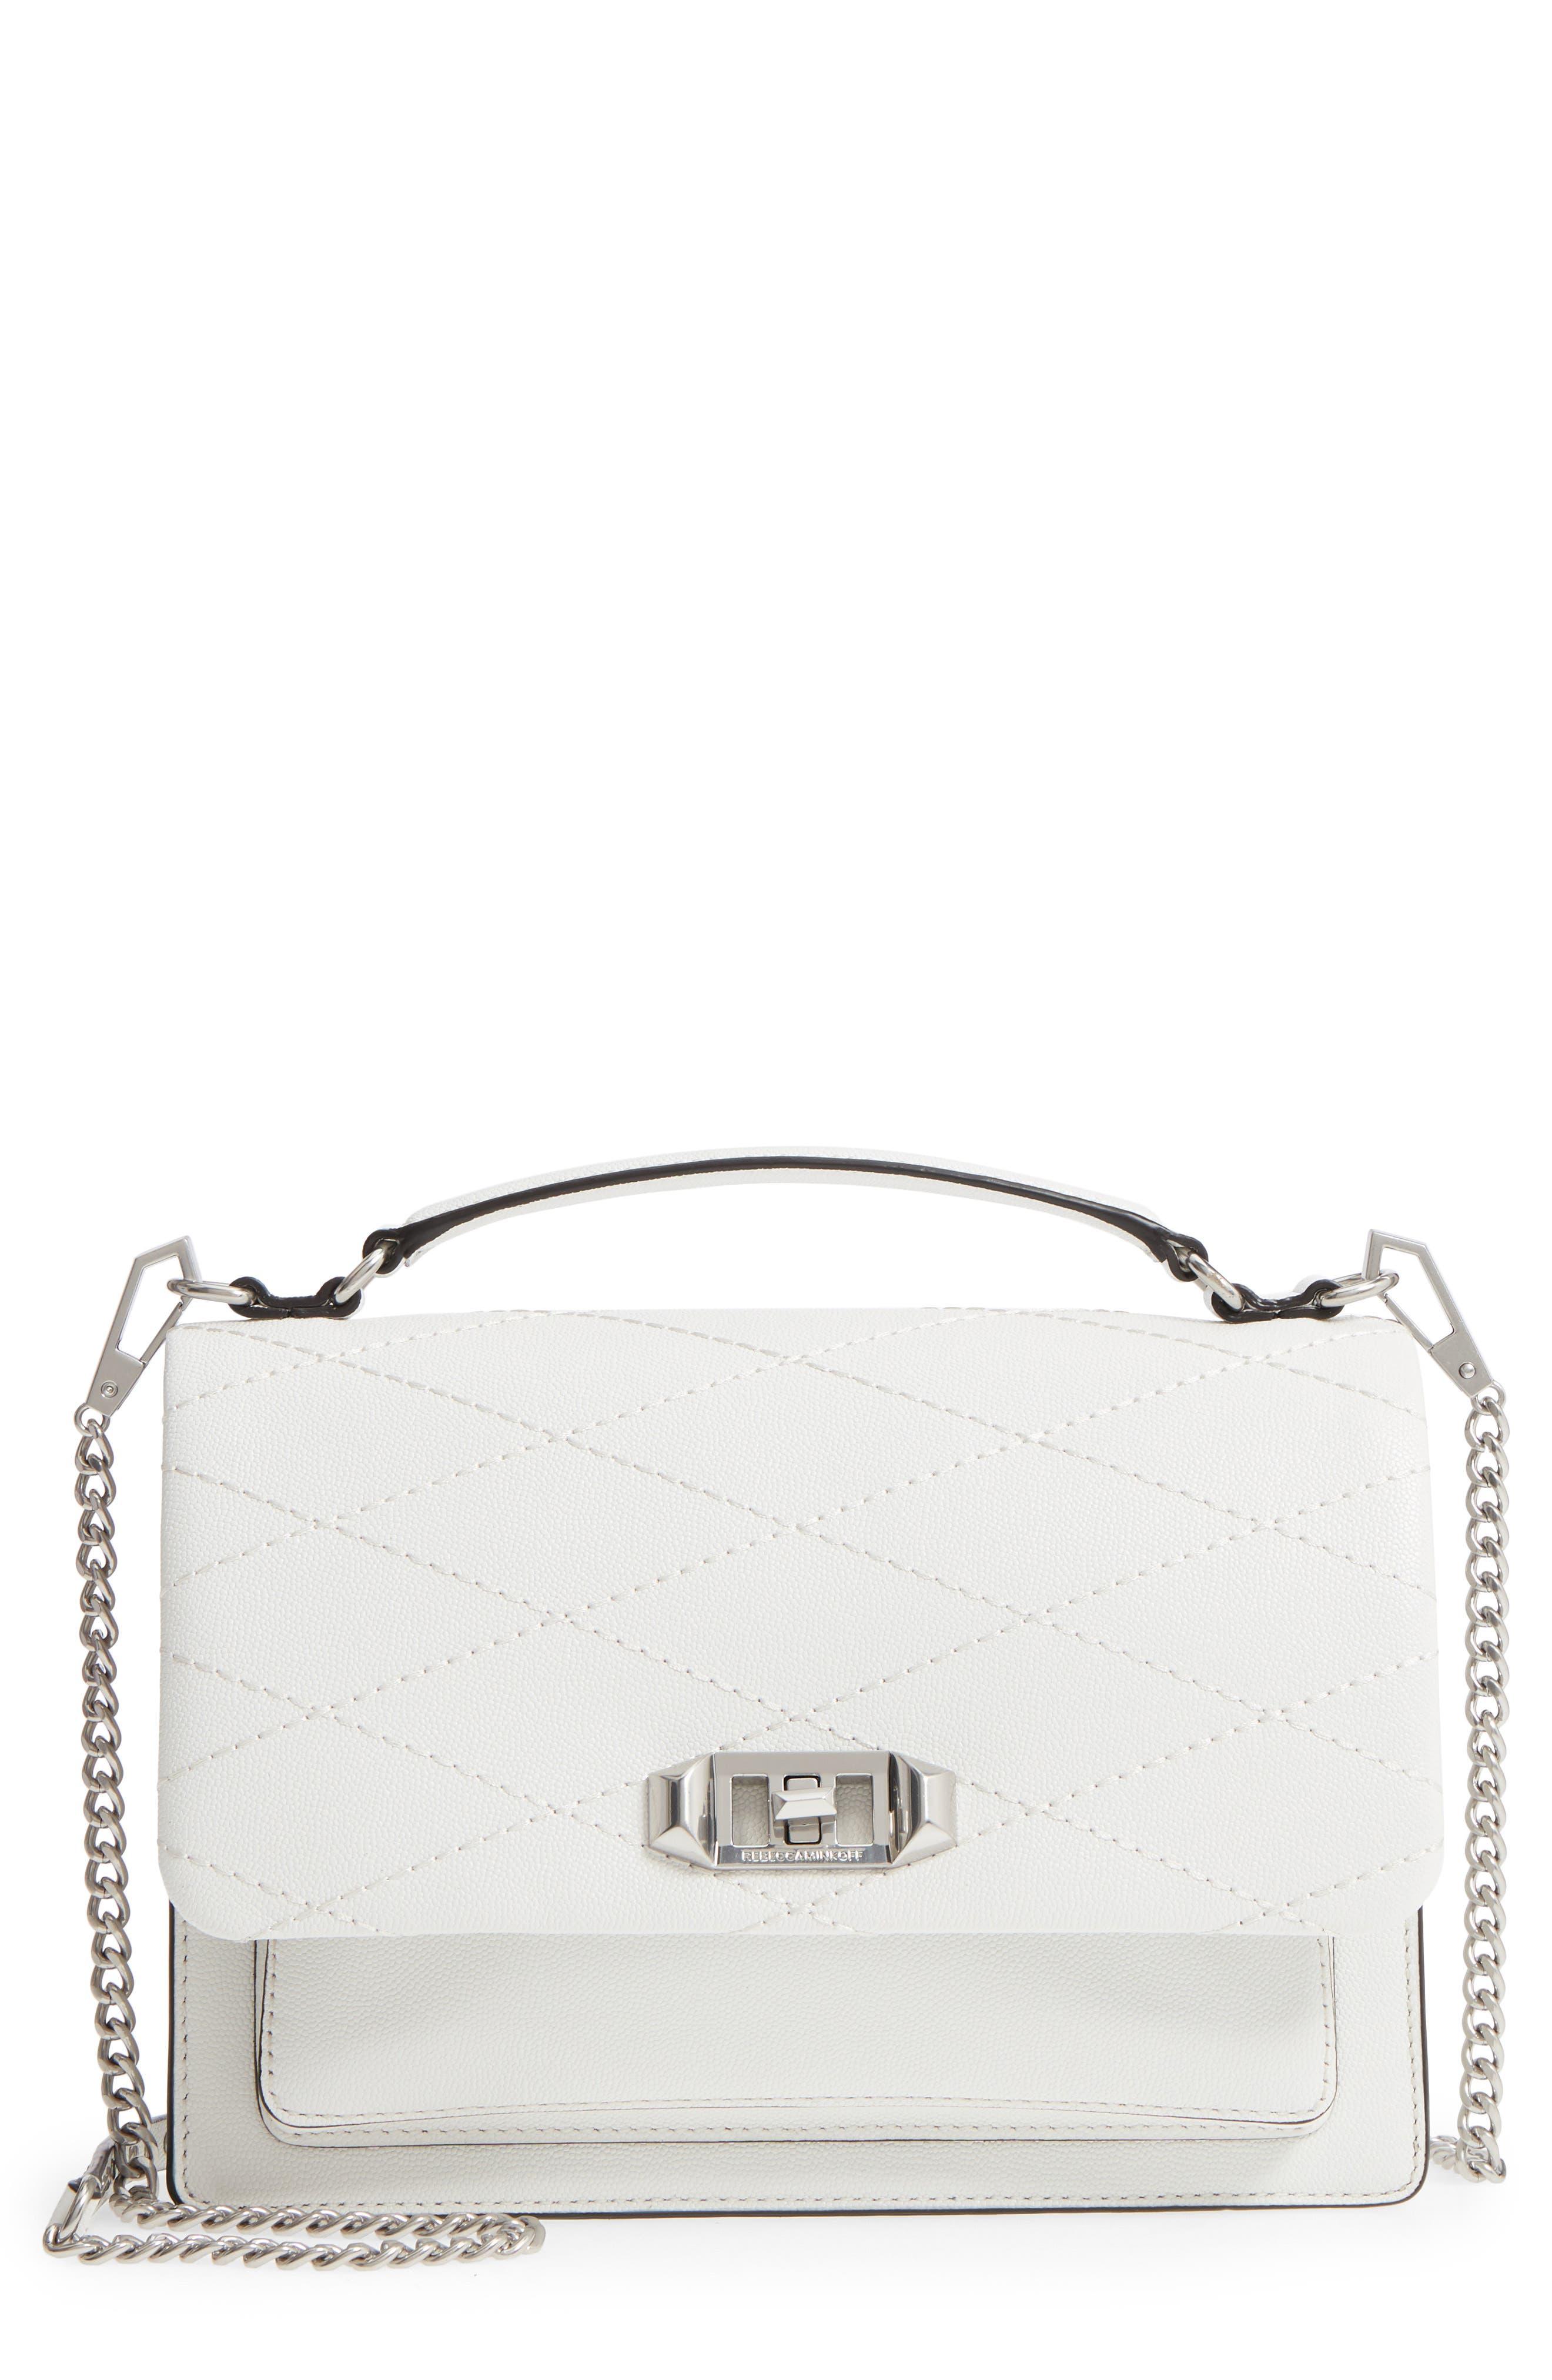 Medium Je T'aime Convertible Leather Crossbody Bag,                             Main thumbnail 3, color,